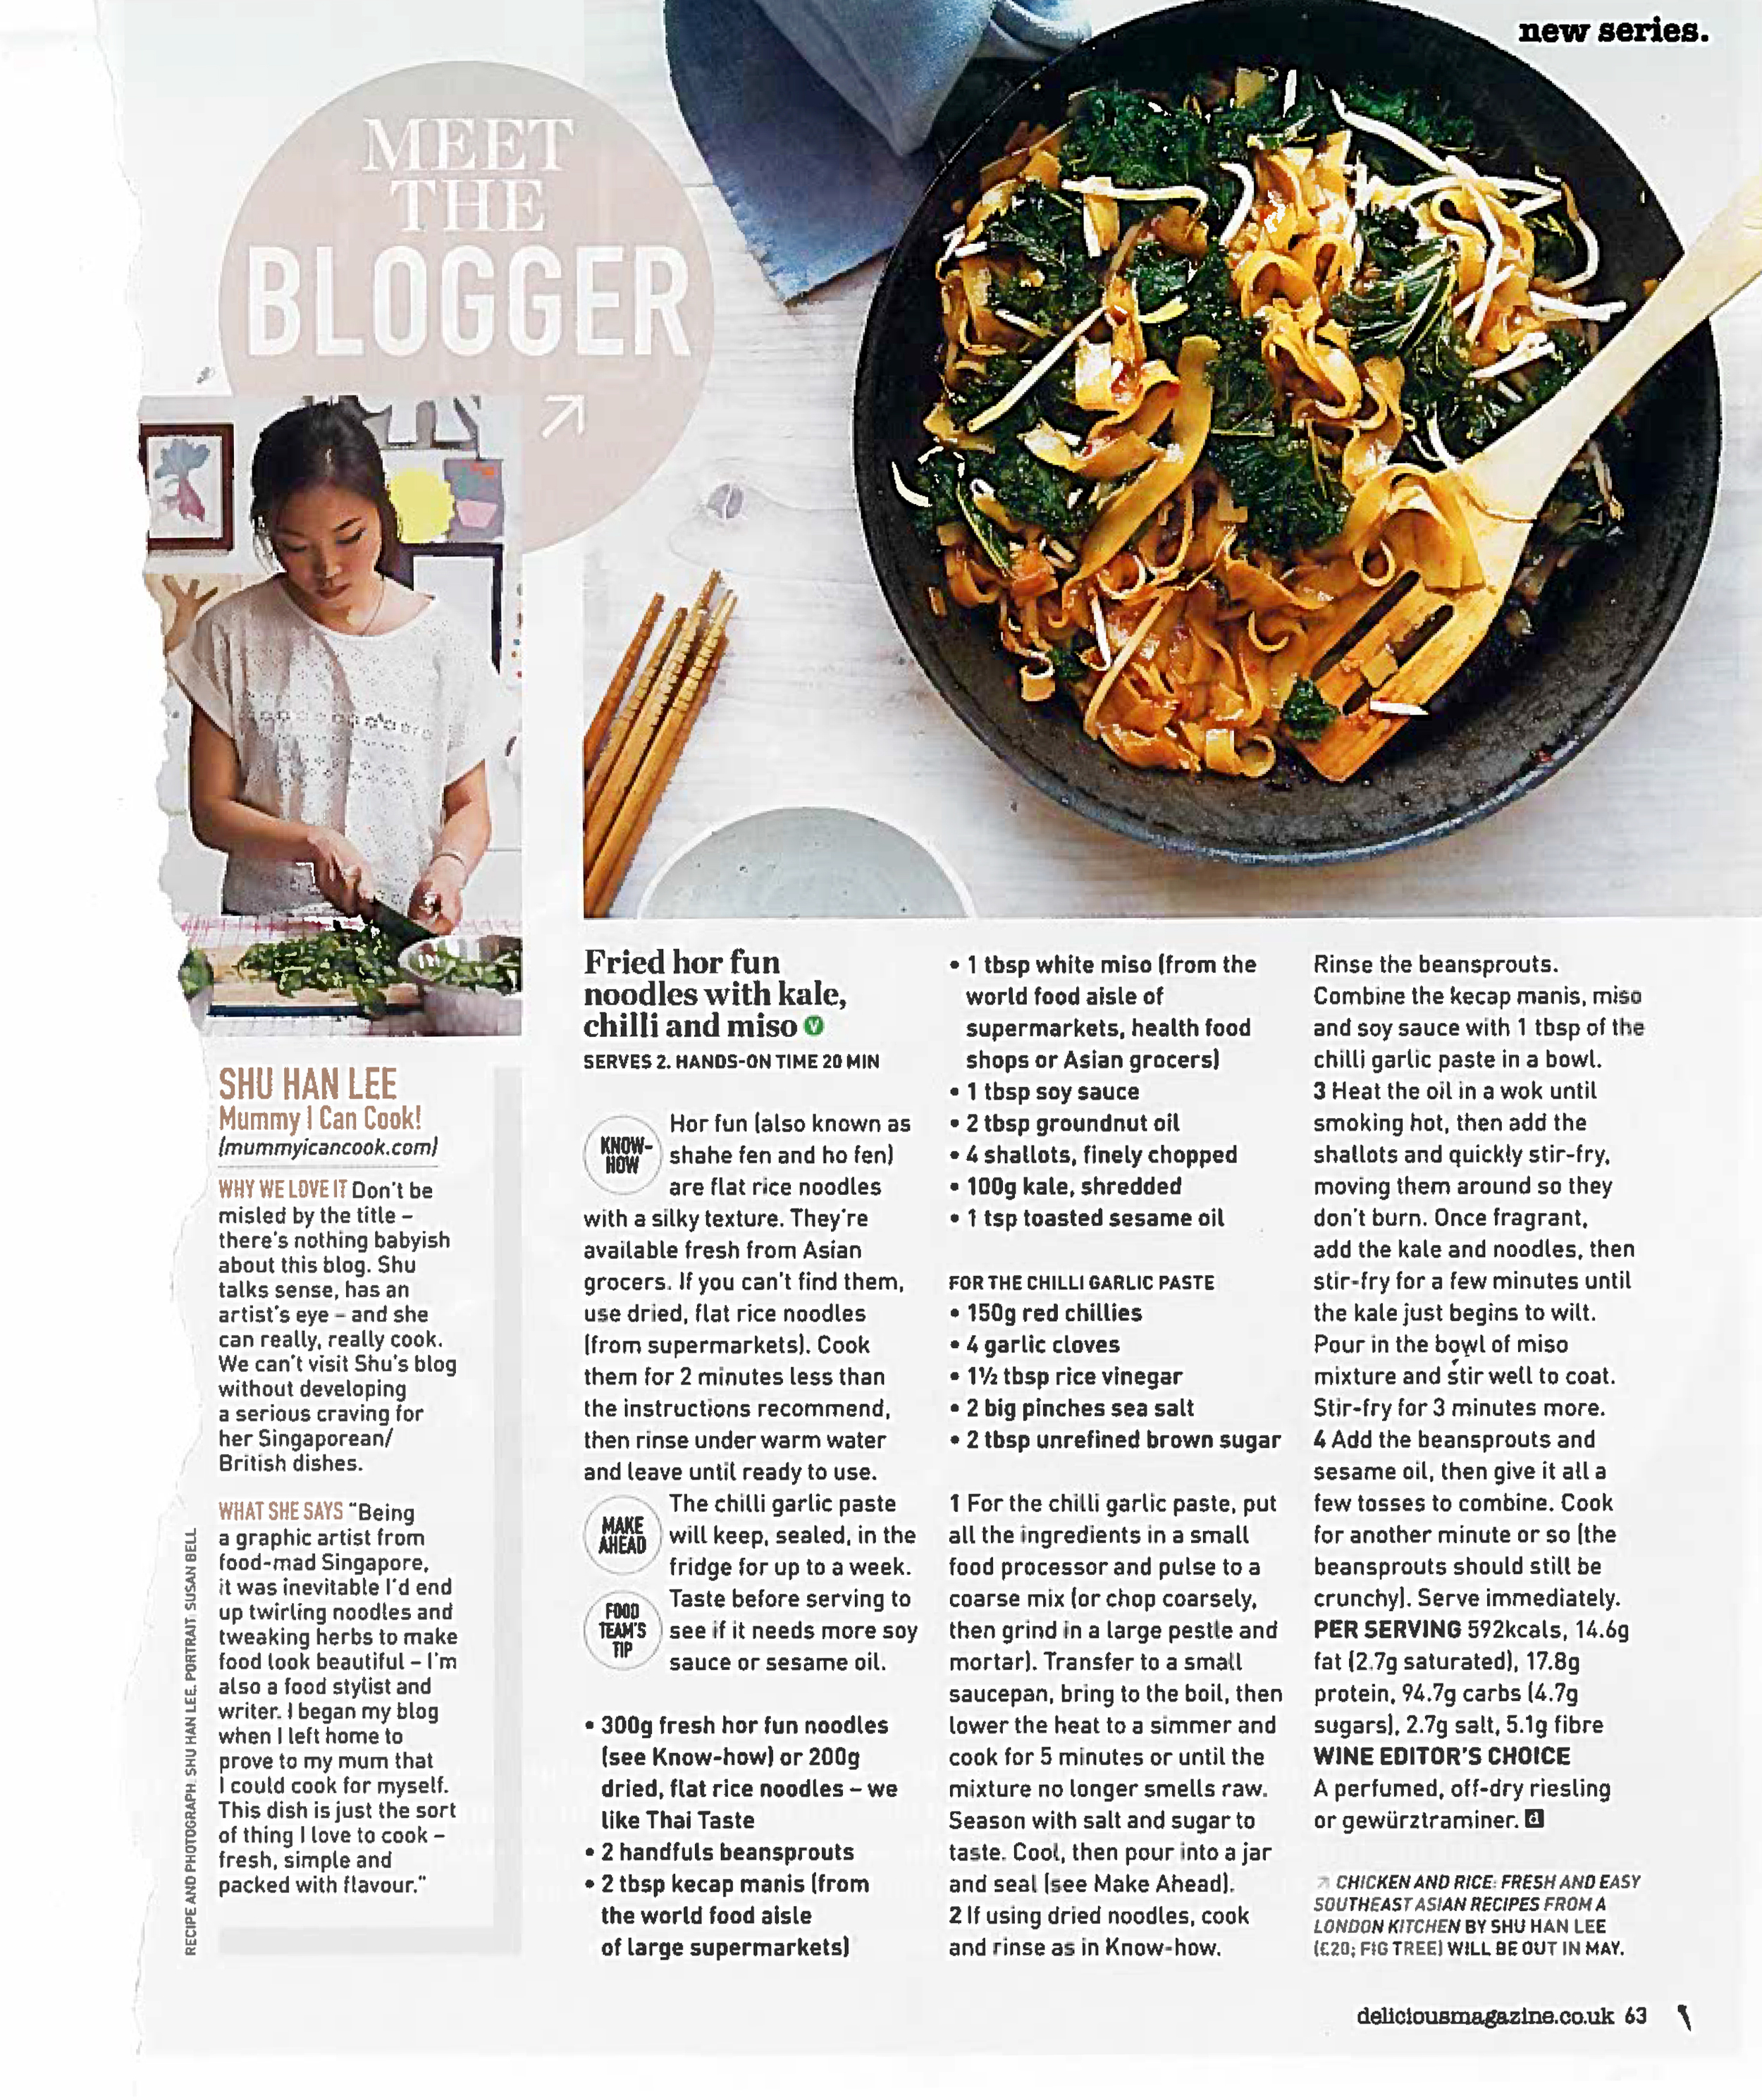 Delicious Magazine, January 2016